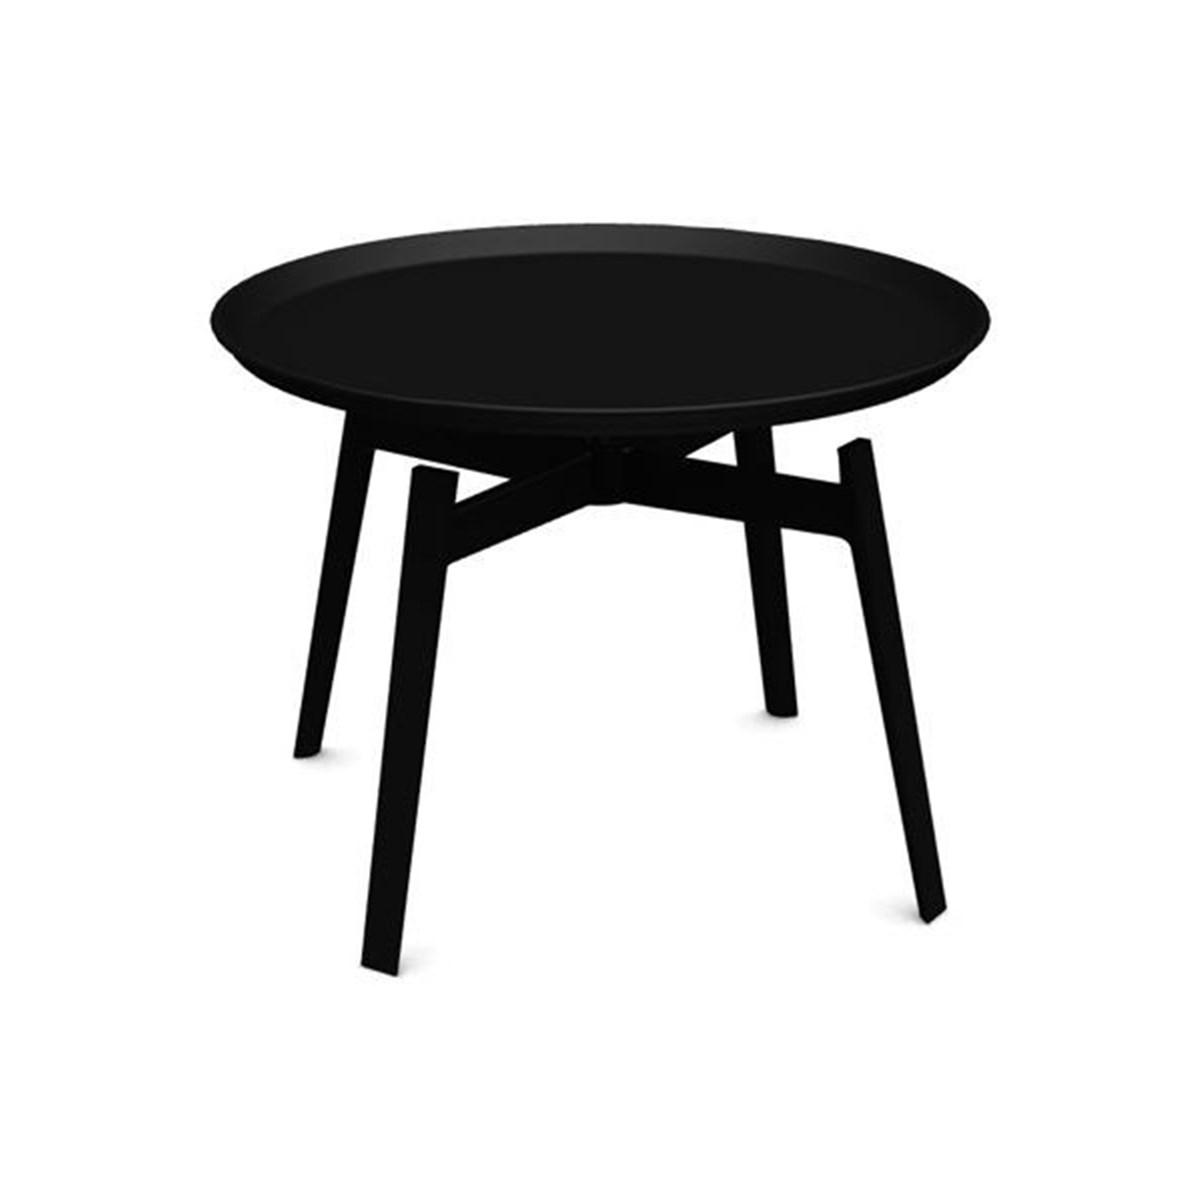 B&B-Italia-Outdoor-Patricia-Urquiola-Husk-Outdoor-Small-Table-Black-Matisse-1